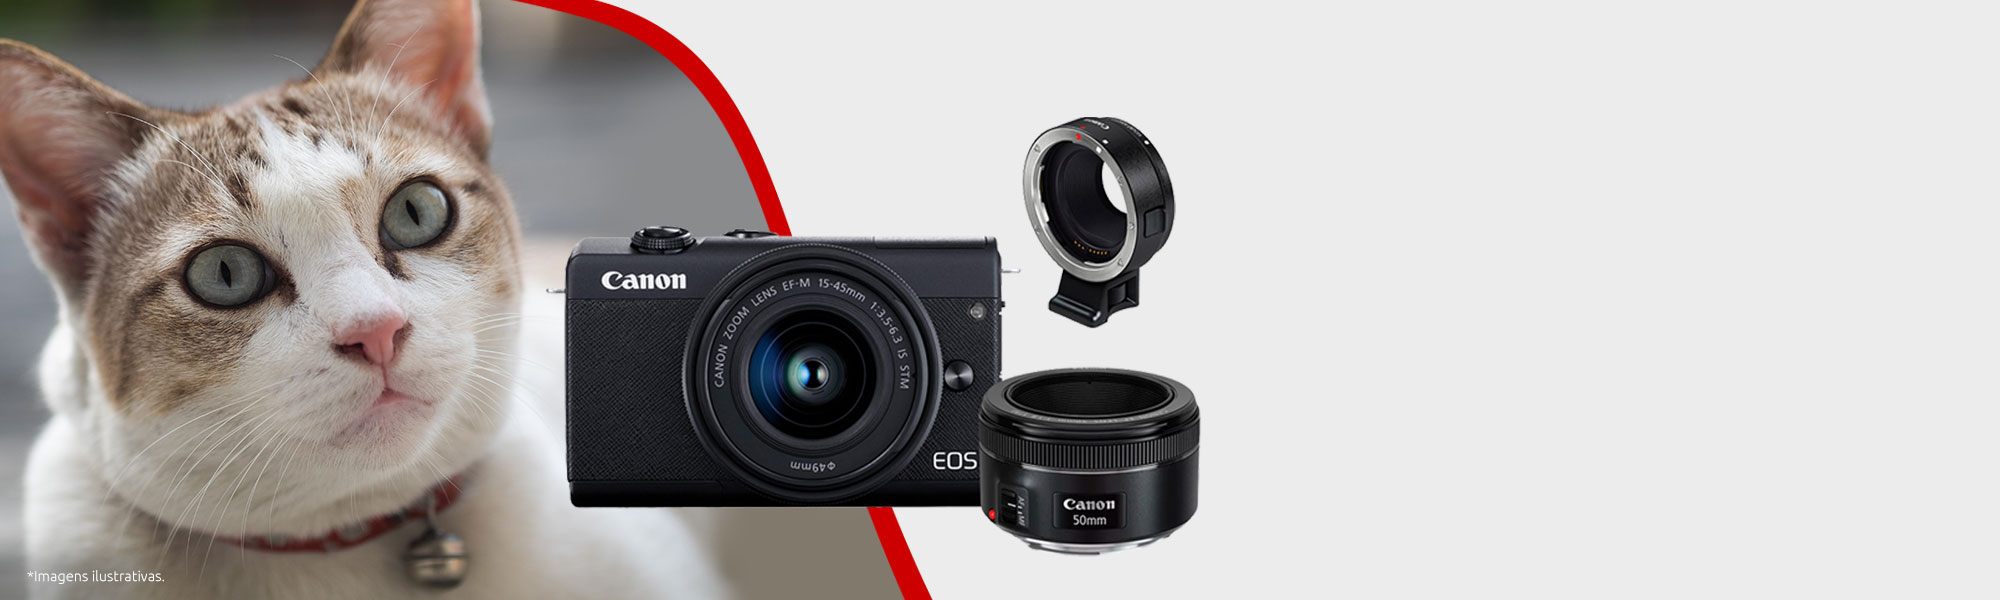 EOS M200 Fotógrafo Básico + ADAPTADOR EF-EOS-M + Lente 50mm